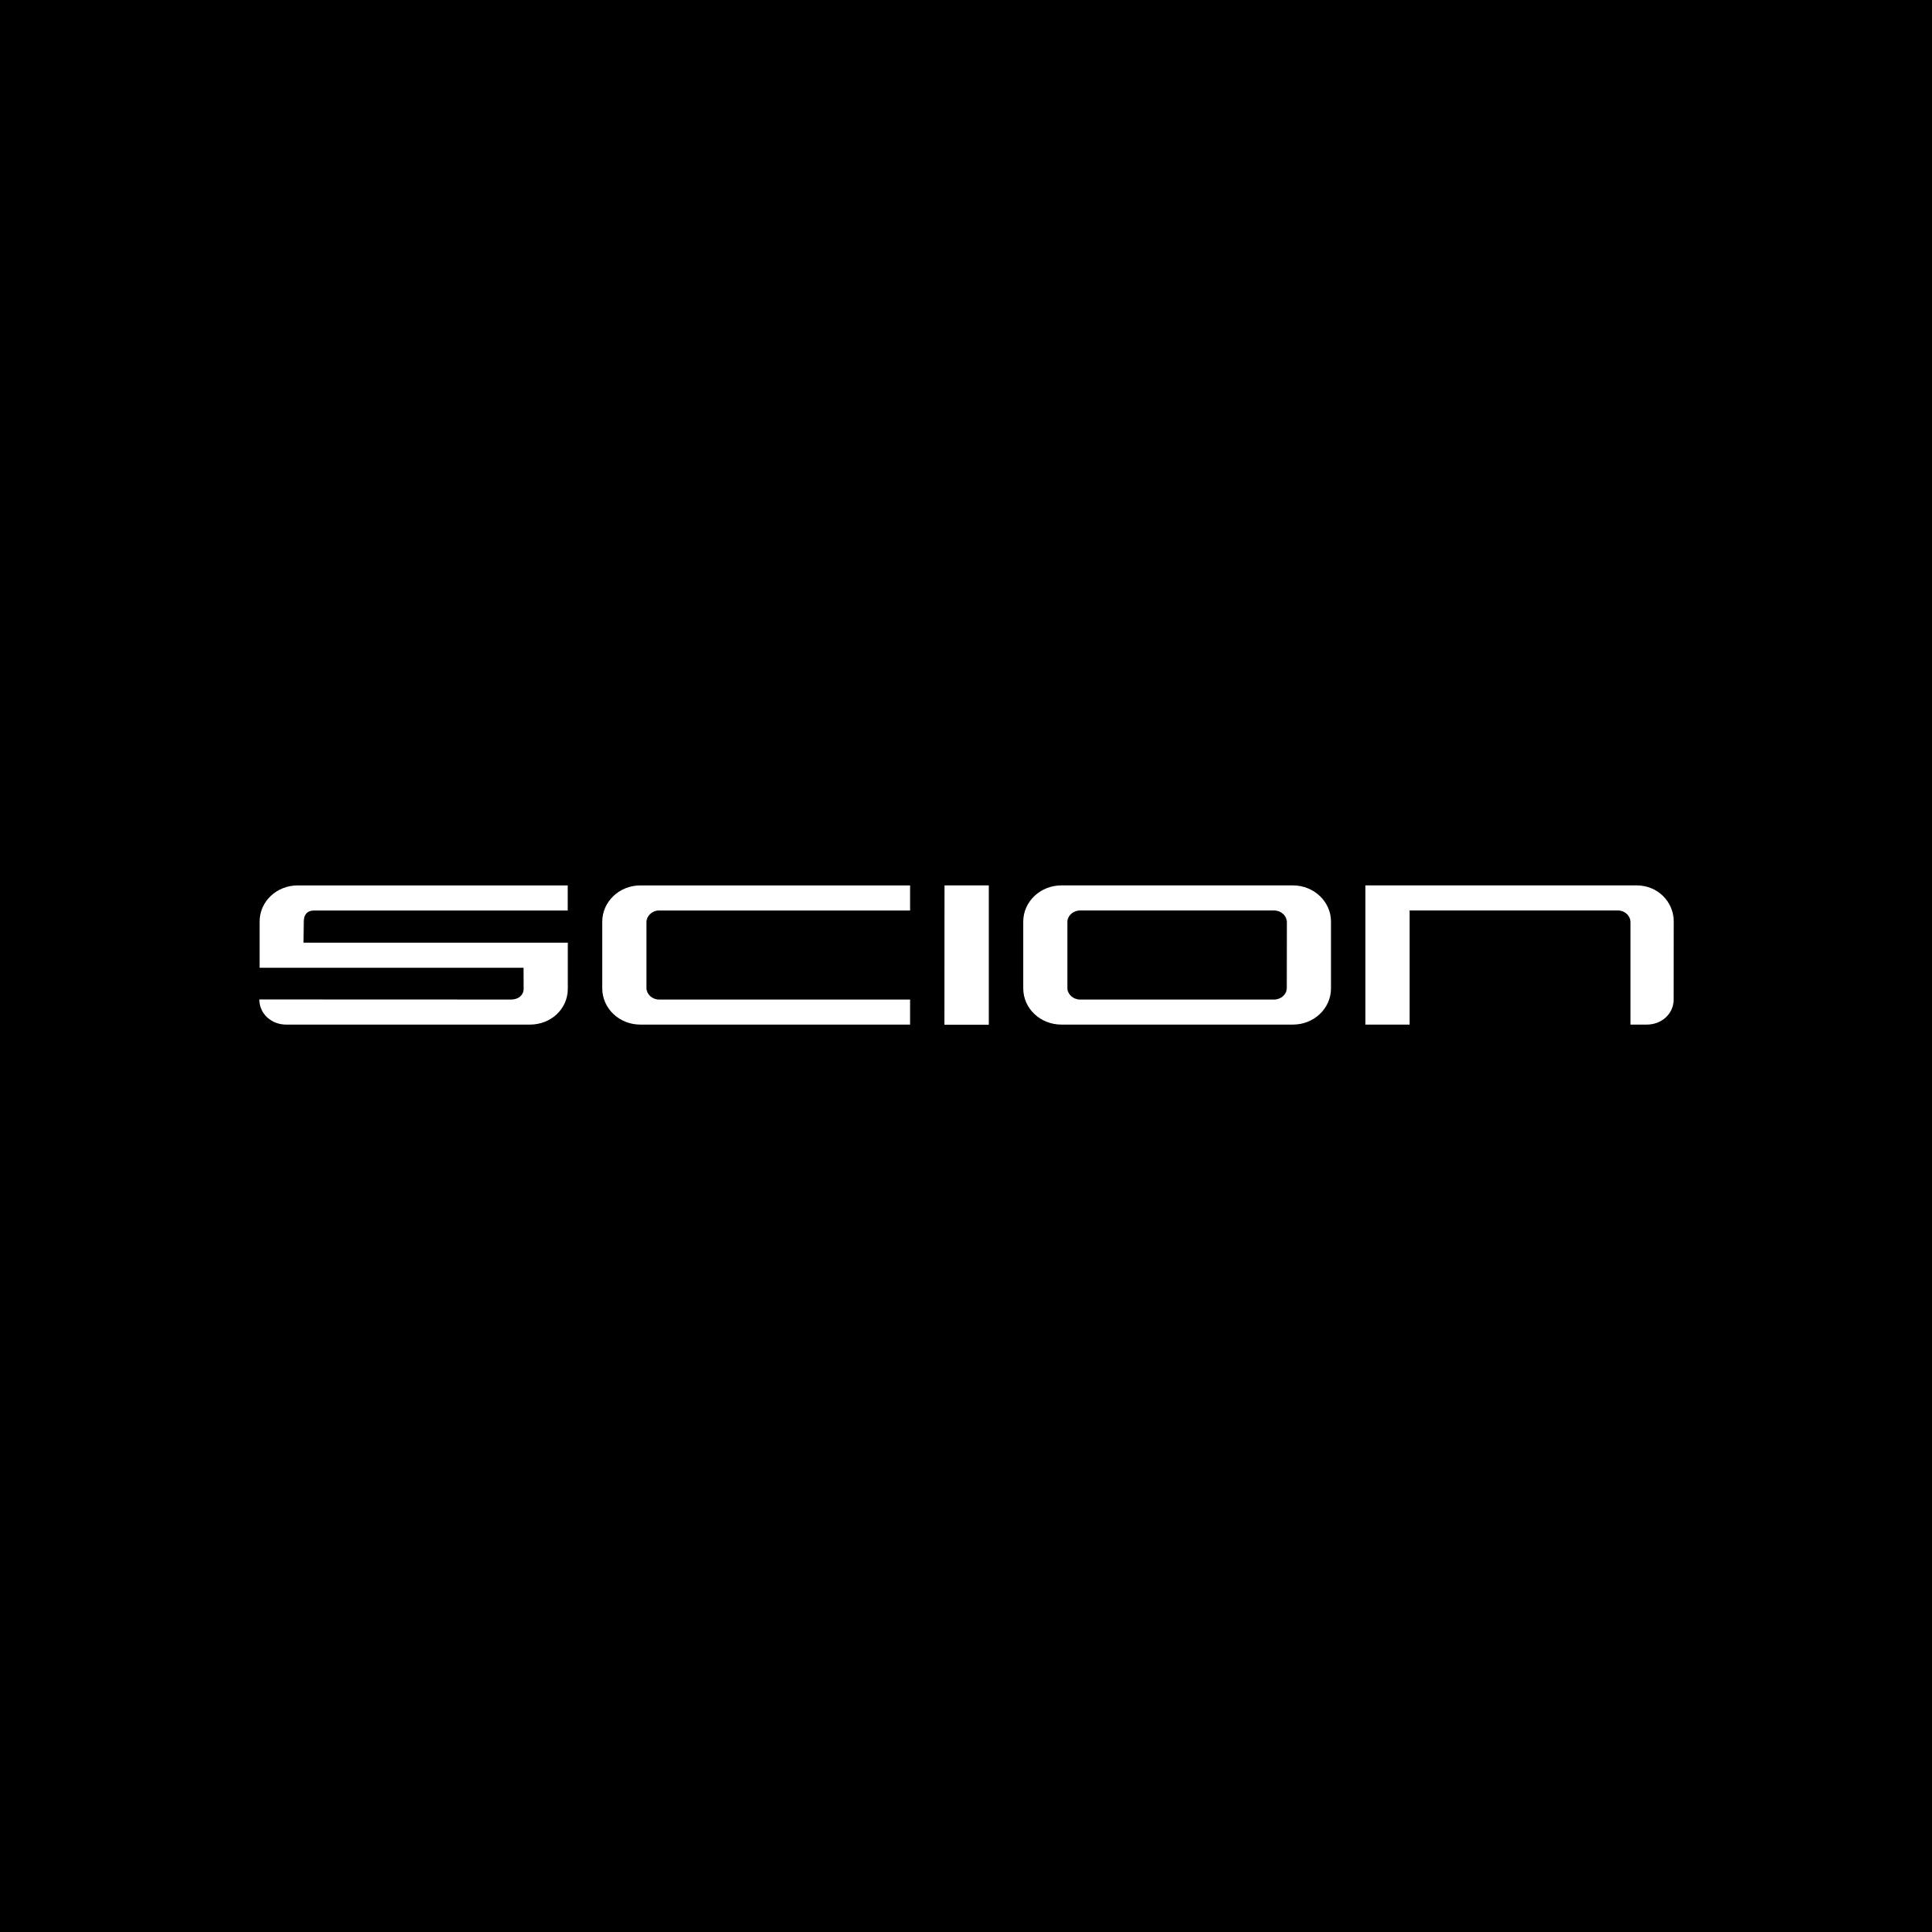 clipart black and white download Vector emblem circle. Scion logo png transparent